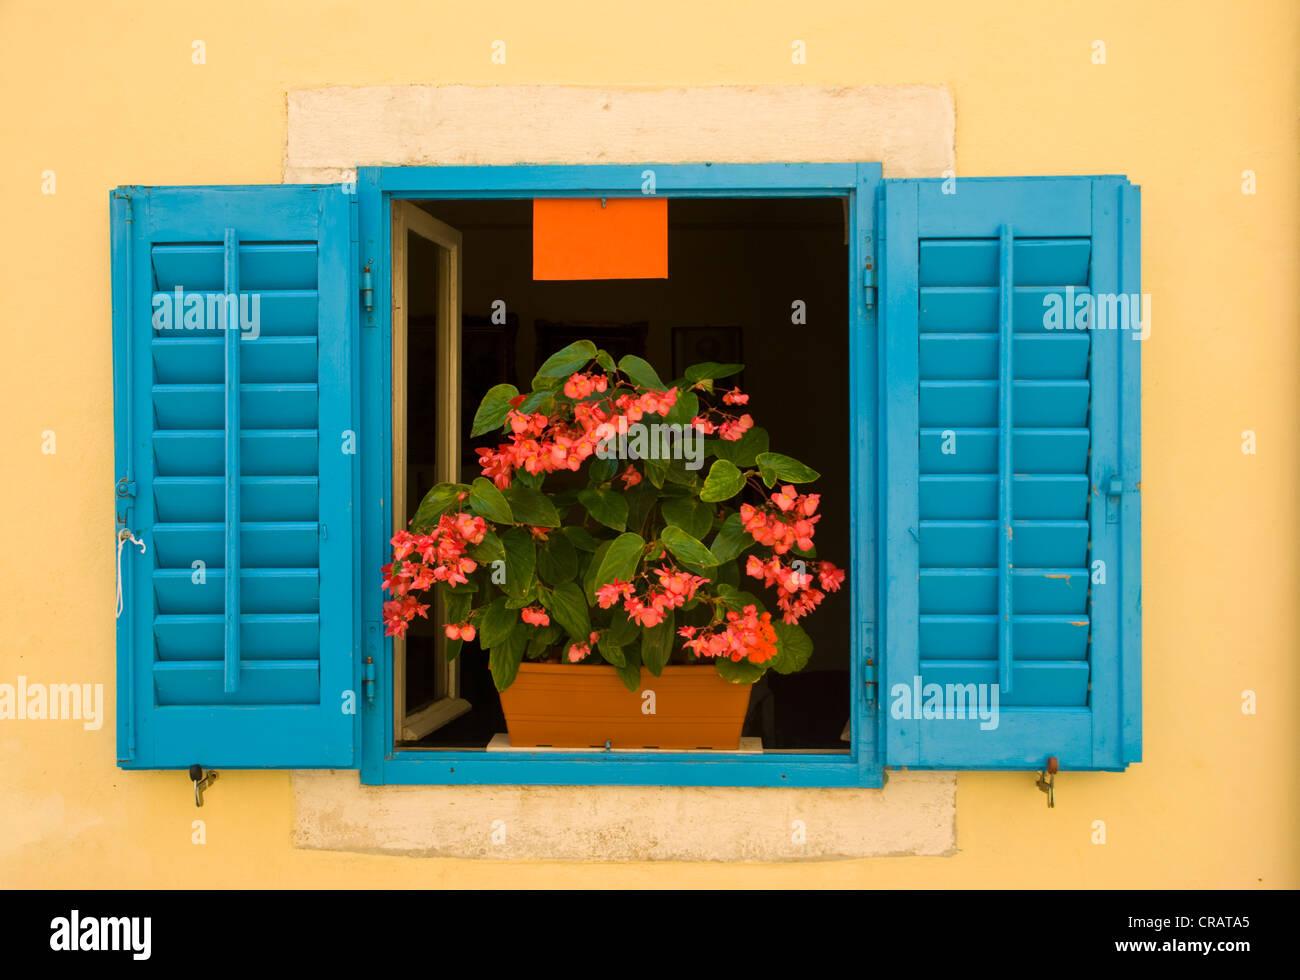 Window with a flower box, Porec, Istria, Croatia, Europe - Stock Image